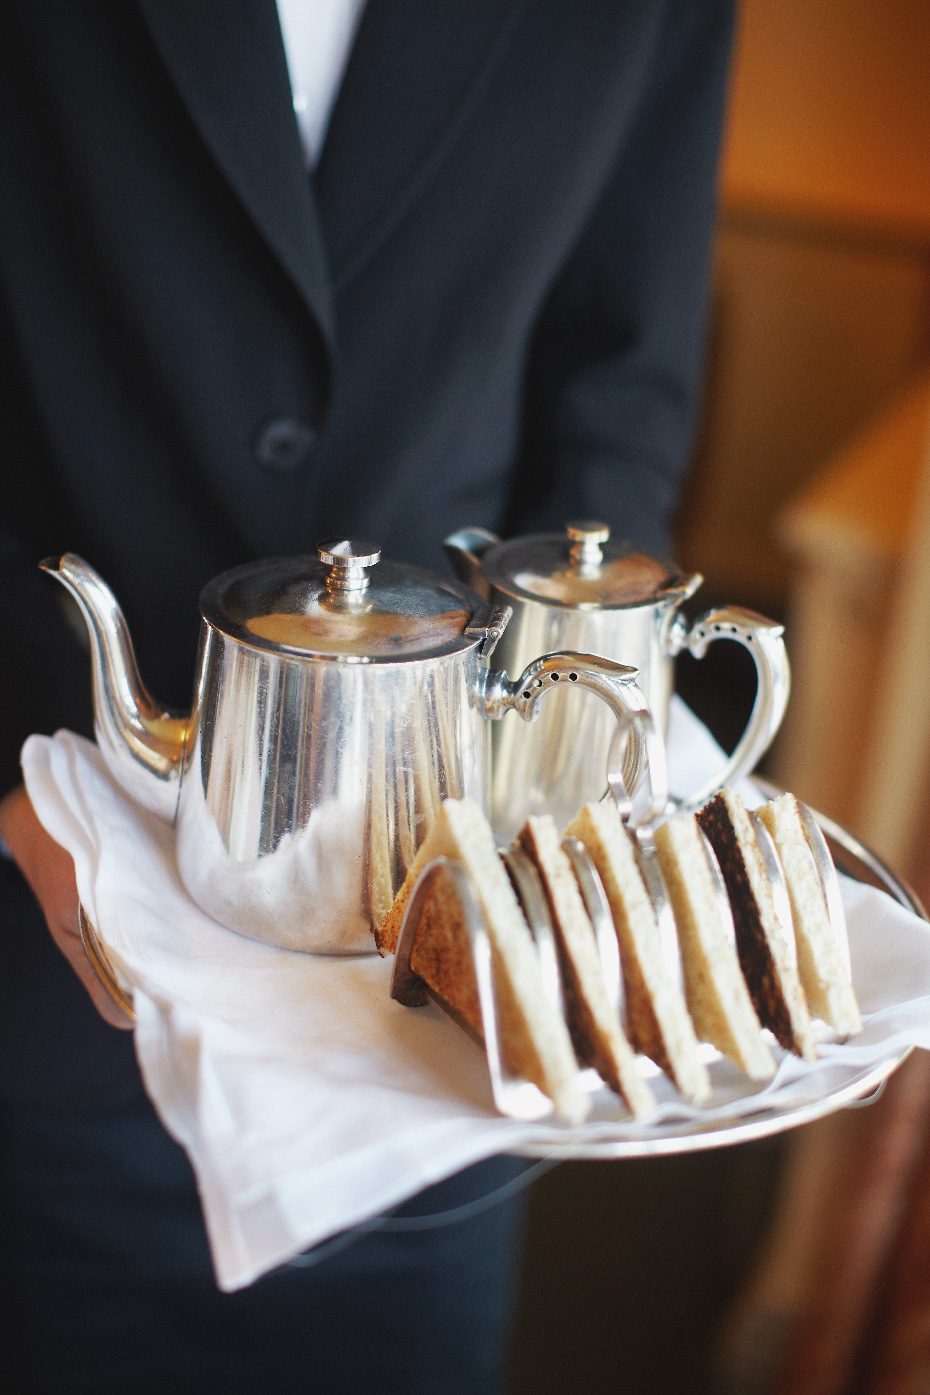 Stacey Van Berkel Photography I Elegant Tea + Toast served for breakfast at Bodyskallen Hall & Spa I Wales